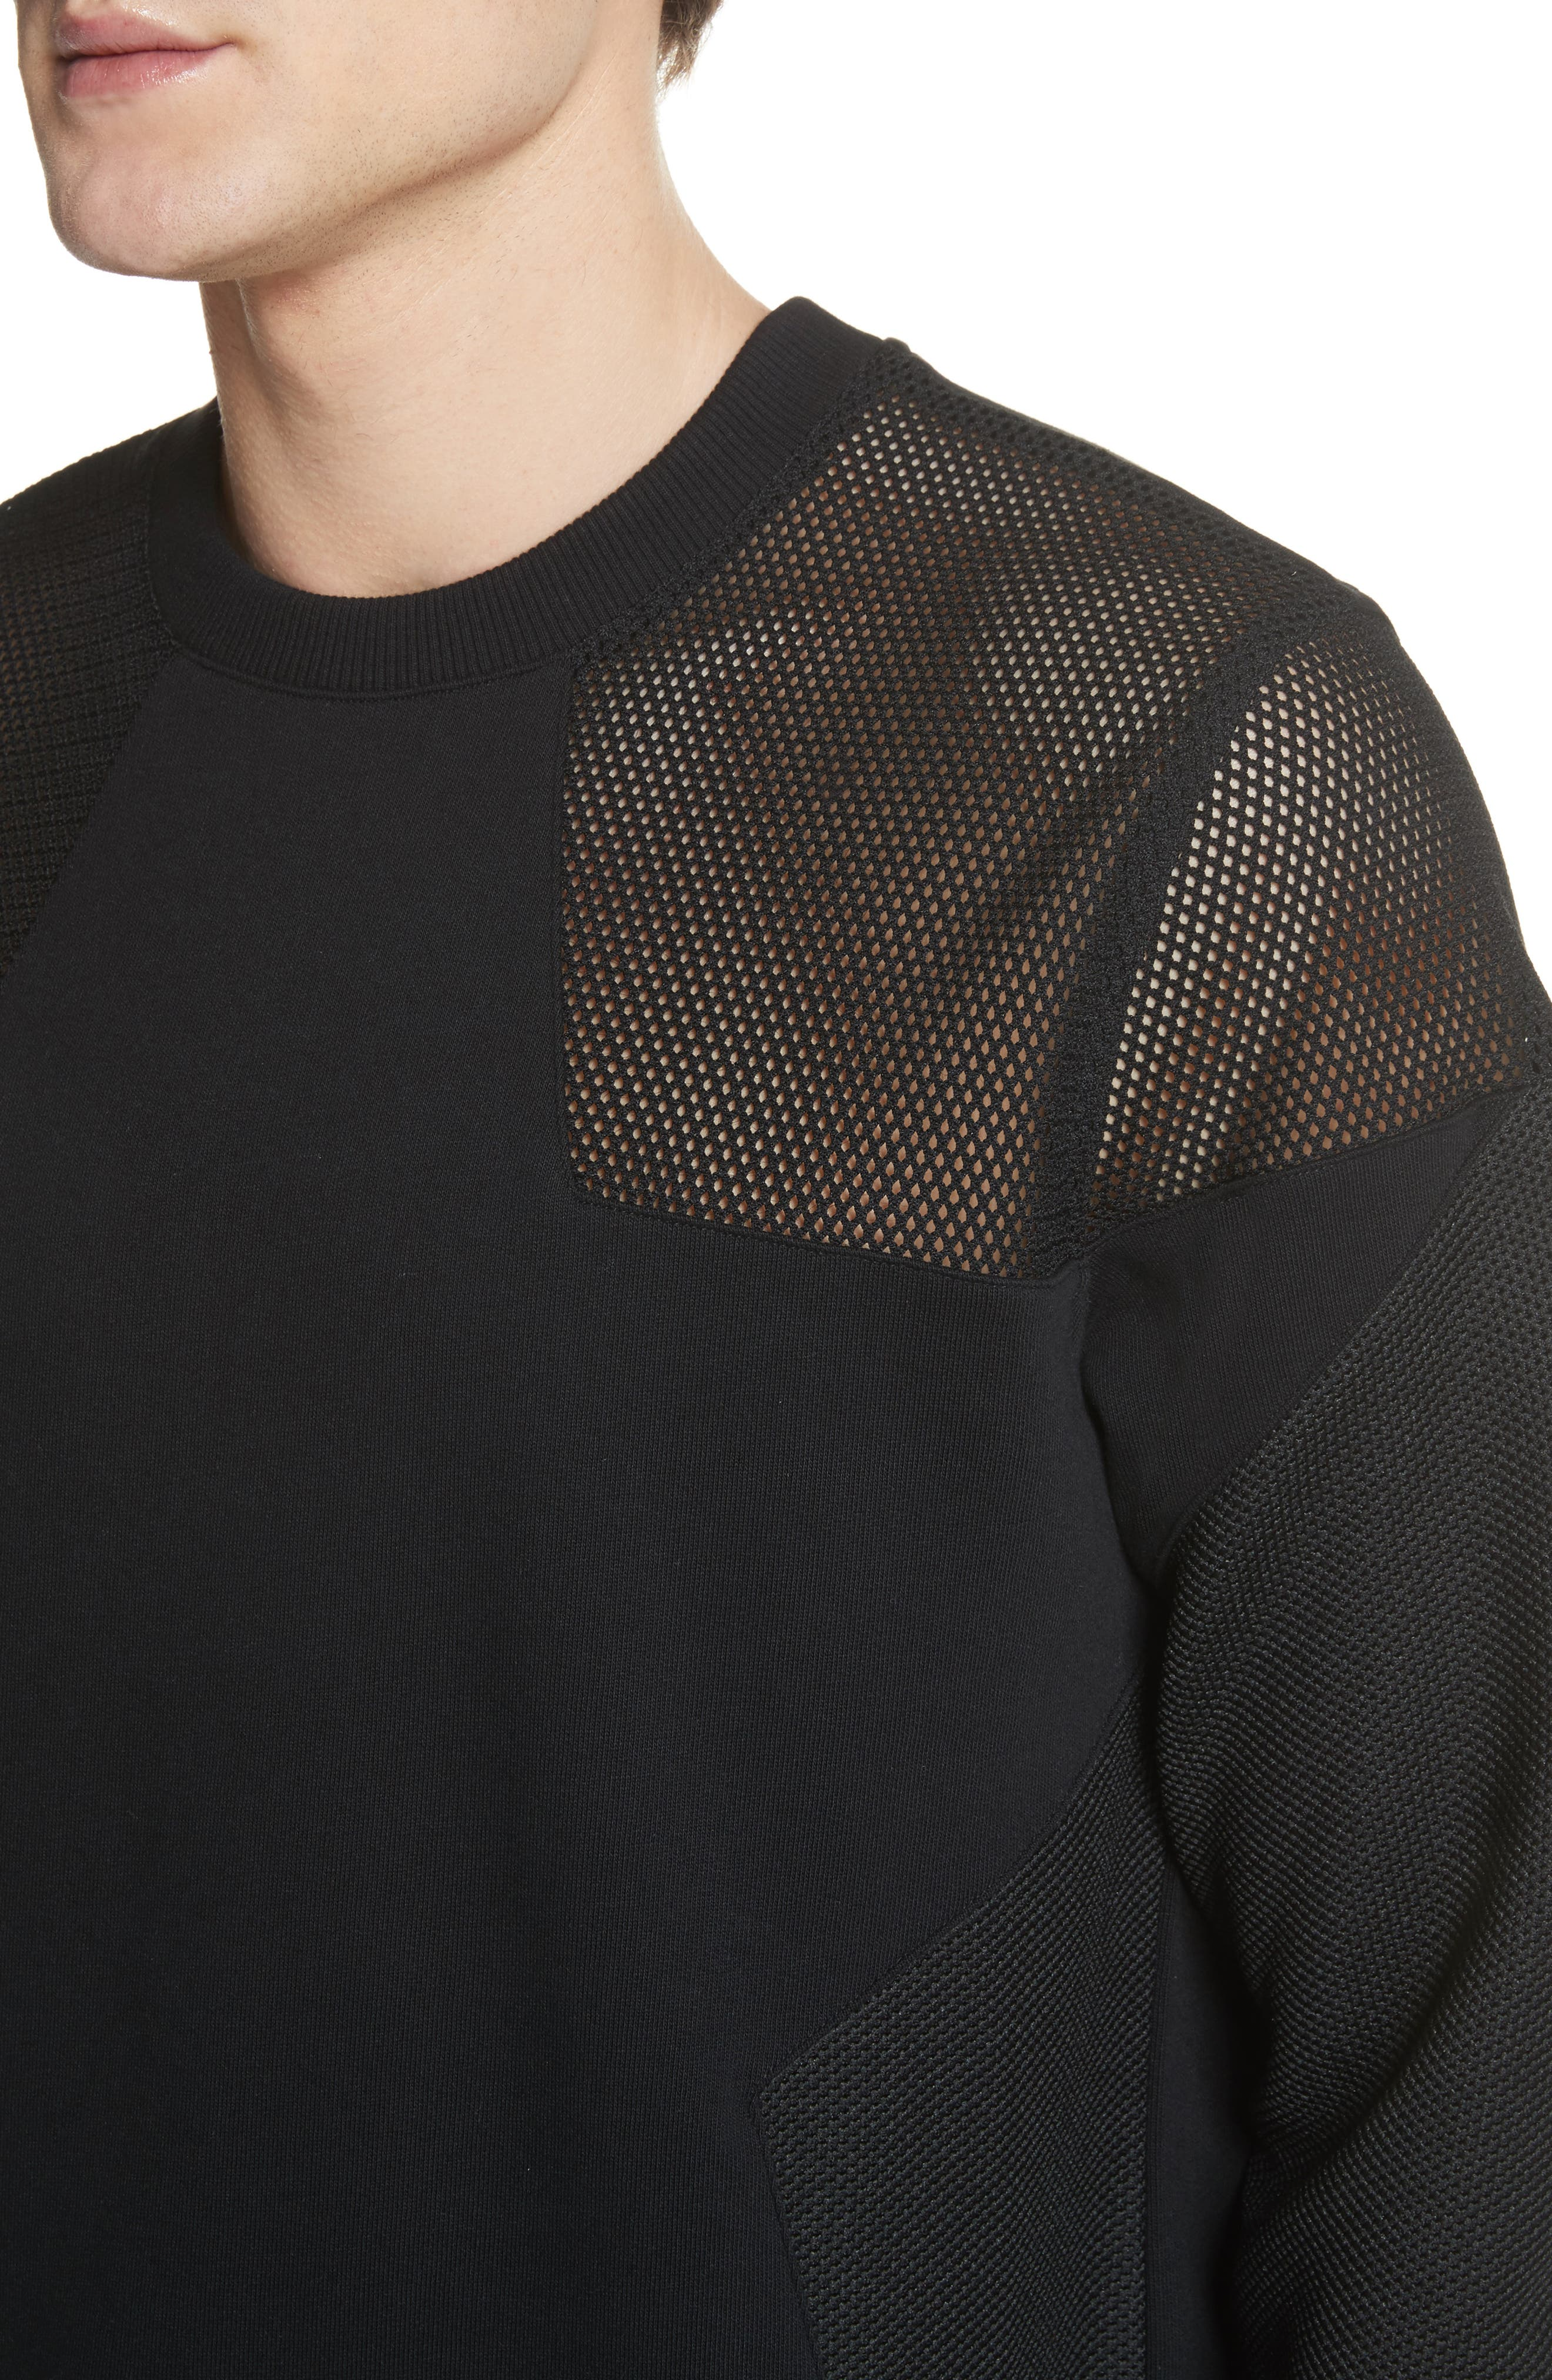 Mesh Star Crewneck Sweatshirt,                             Alternate thumbnail 4, color,                             Black